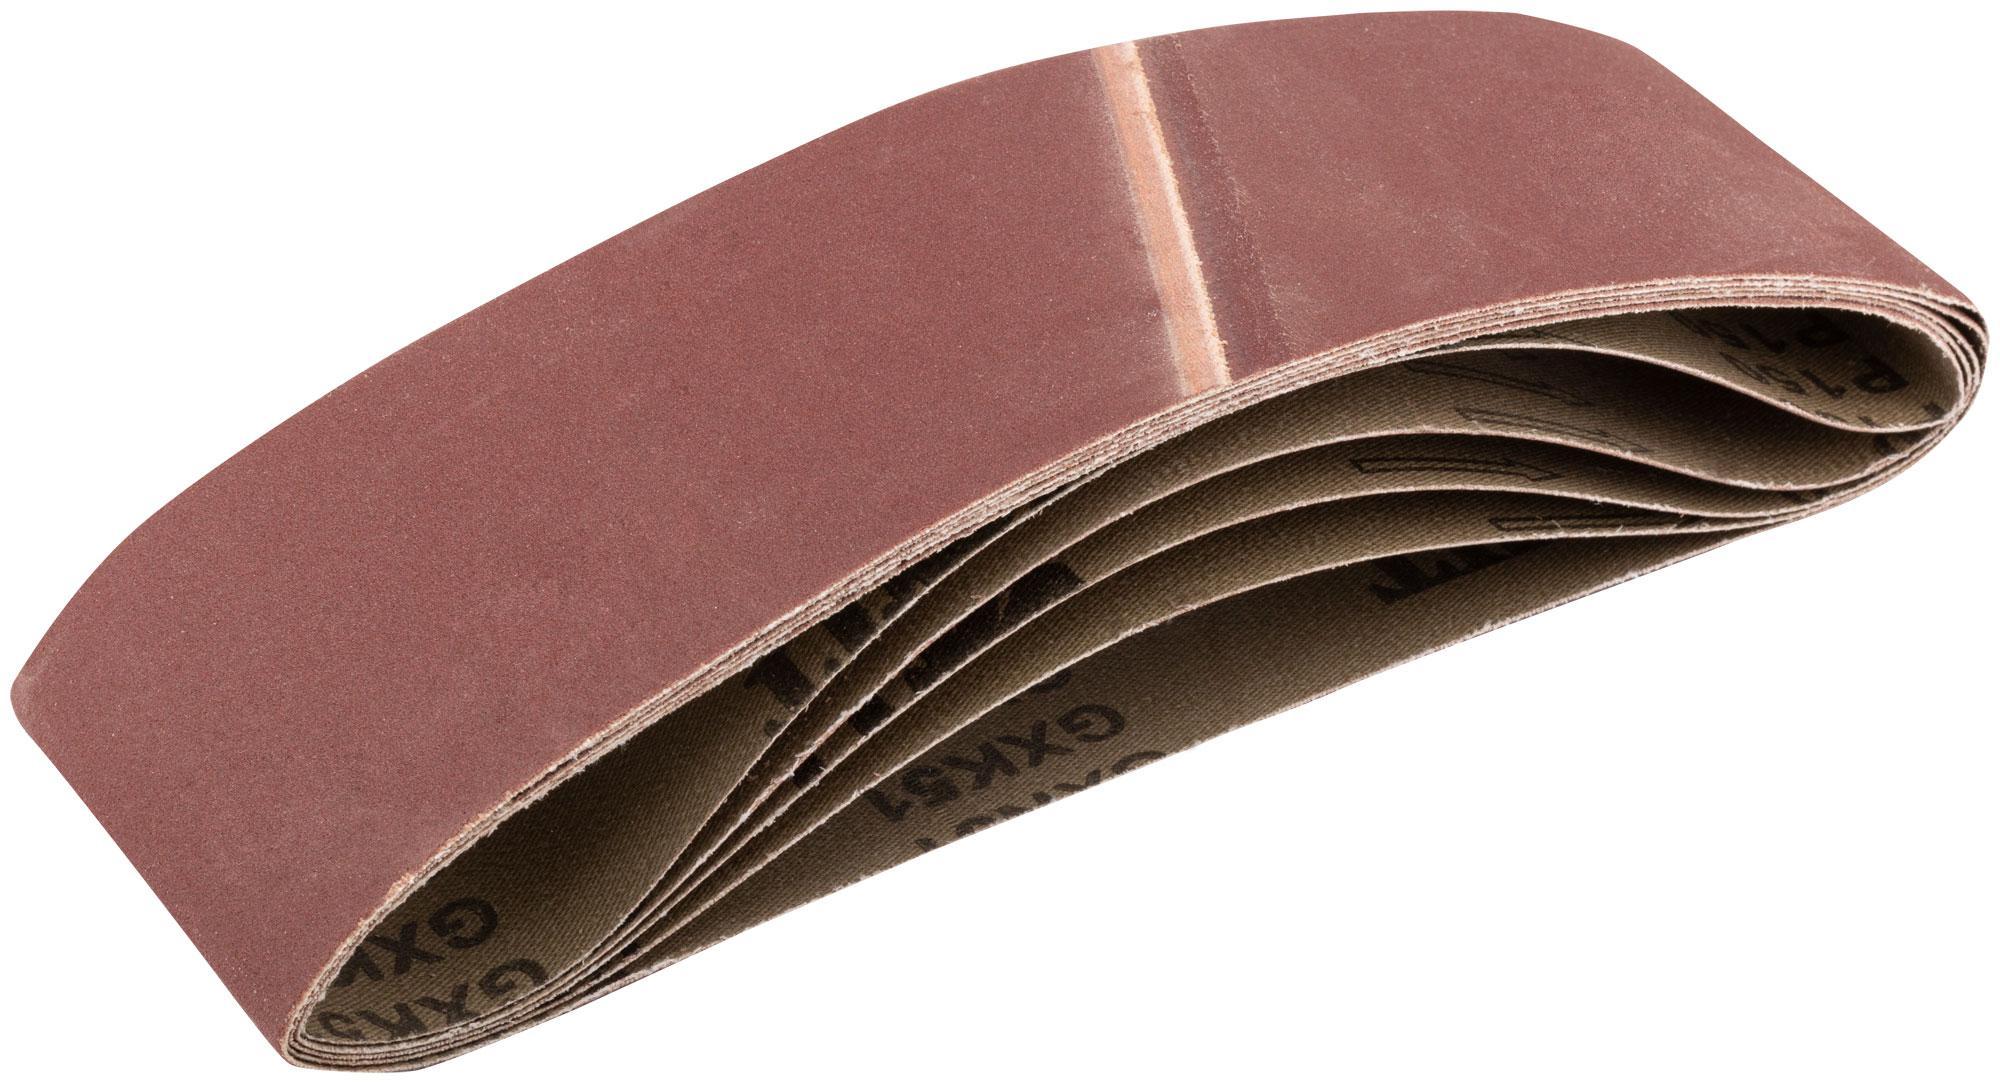 Лента шлифовальная бесконечная Fit 39697 лента абразивная fit 533 мм х 75 мм зерно 150 5 шт